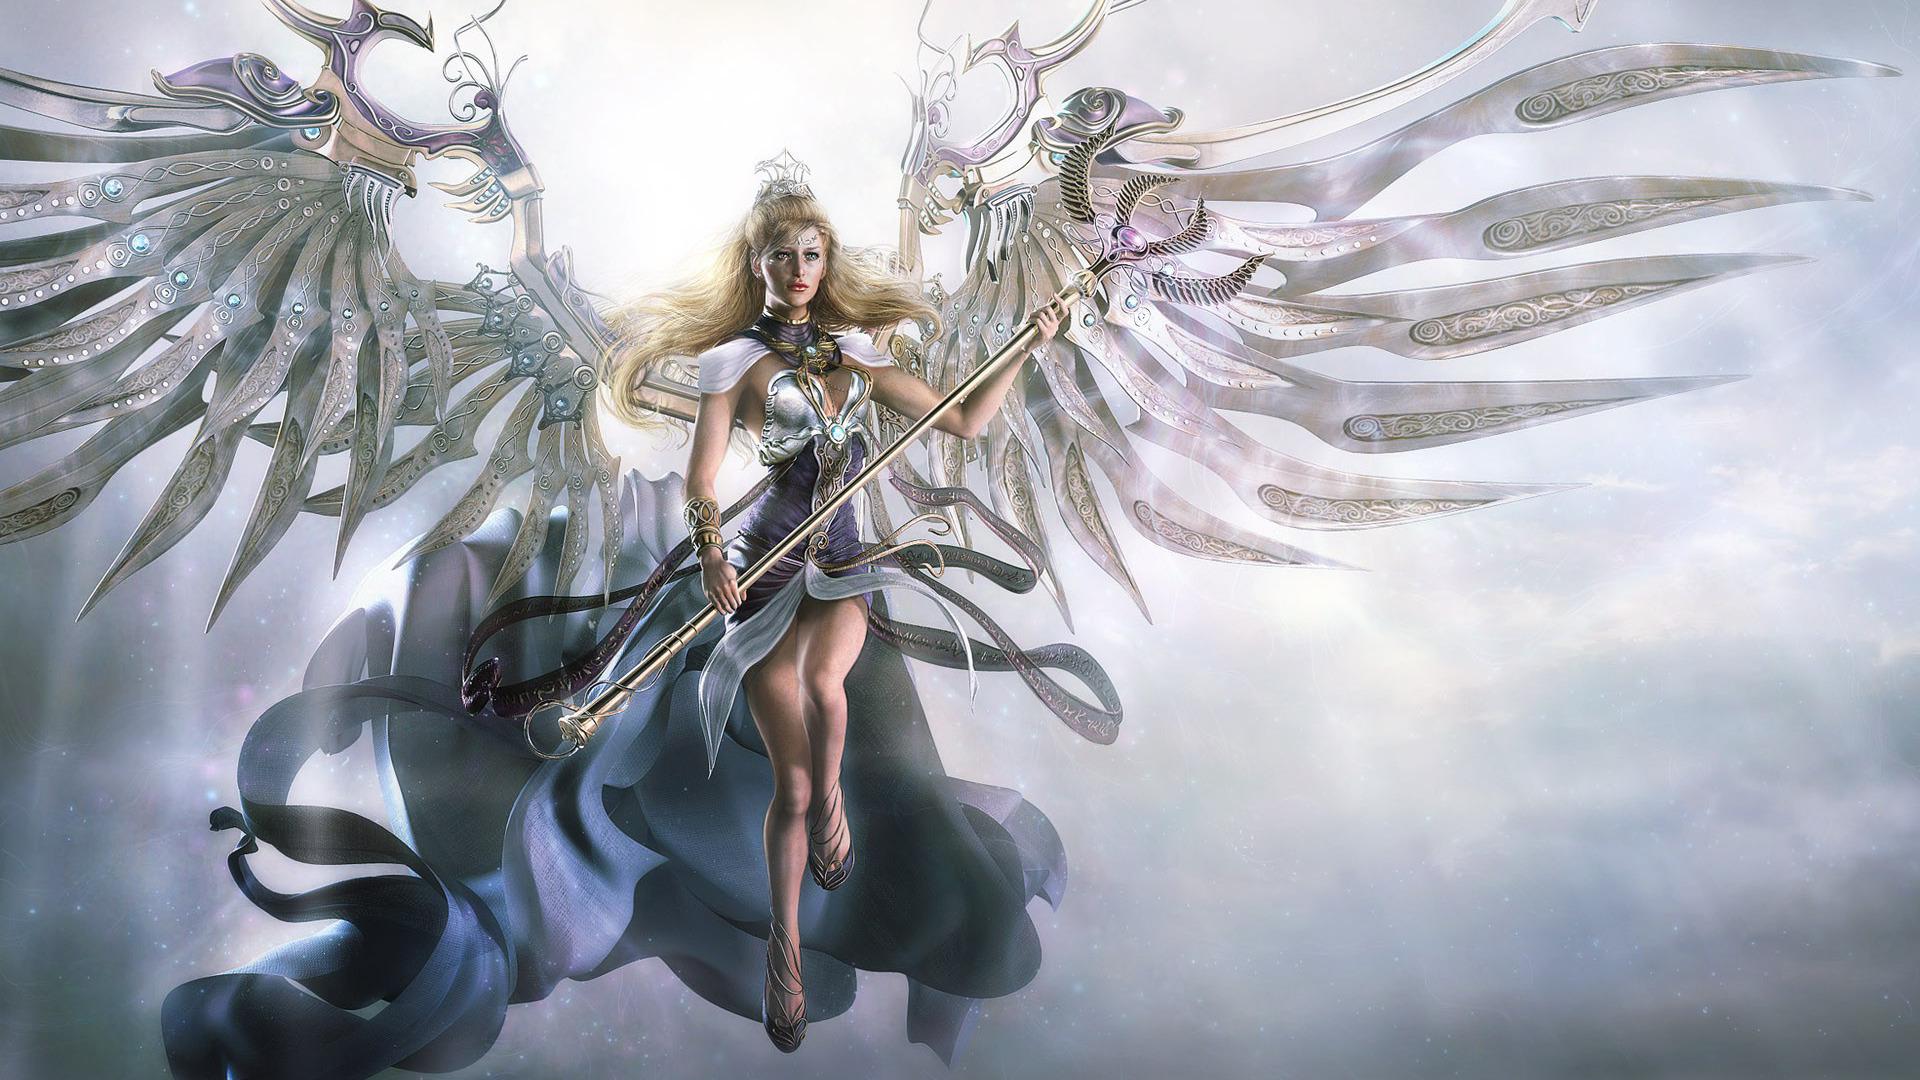 Download Angel with metal wings wallpaper 1920x1080